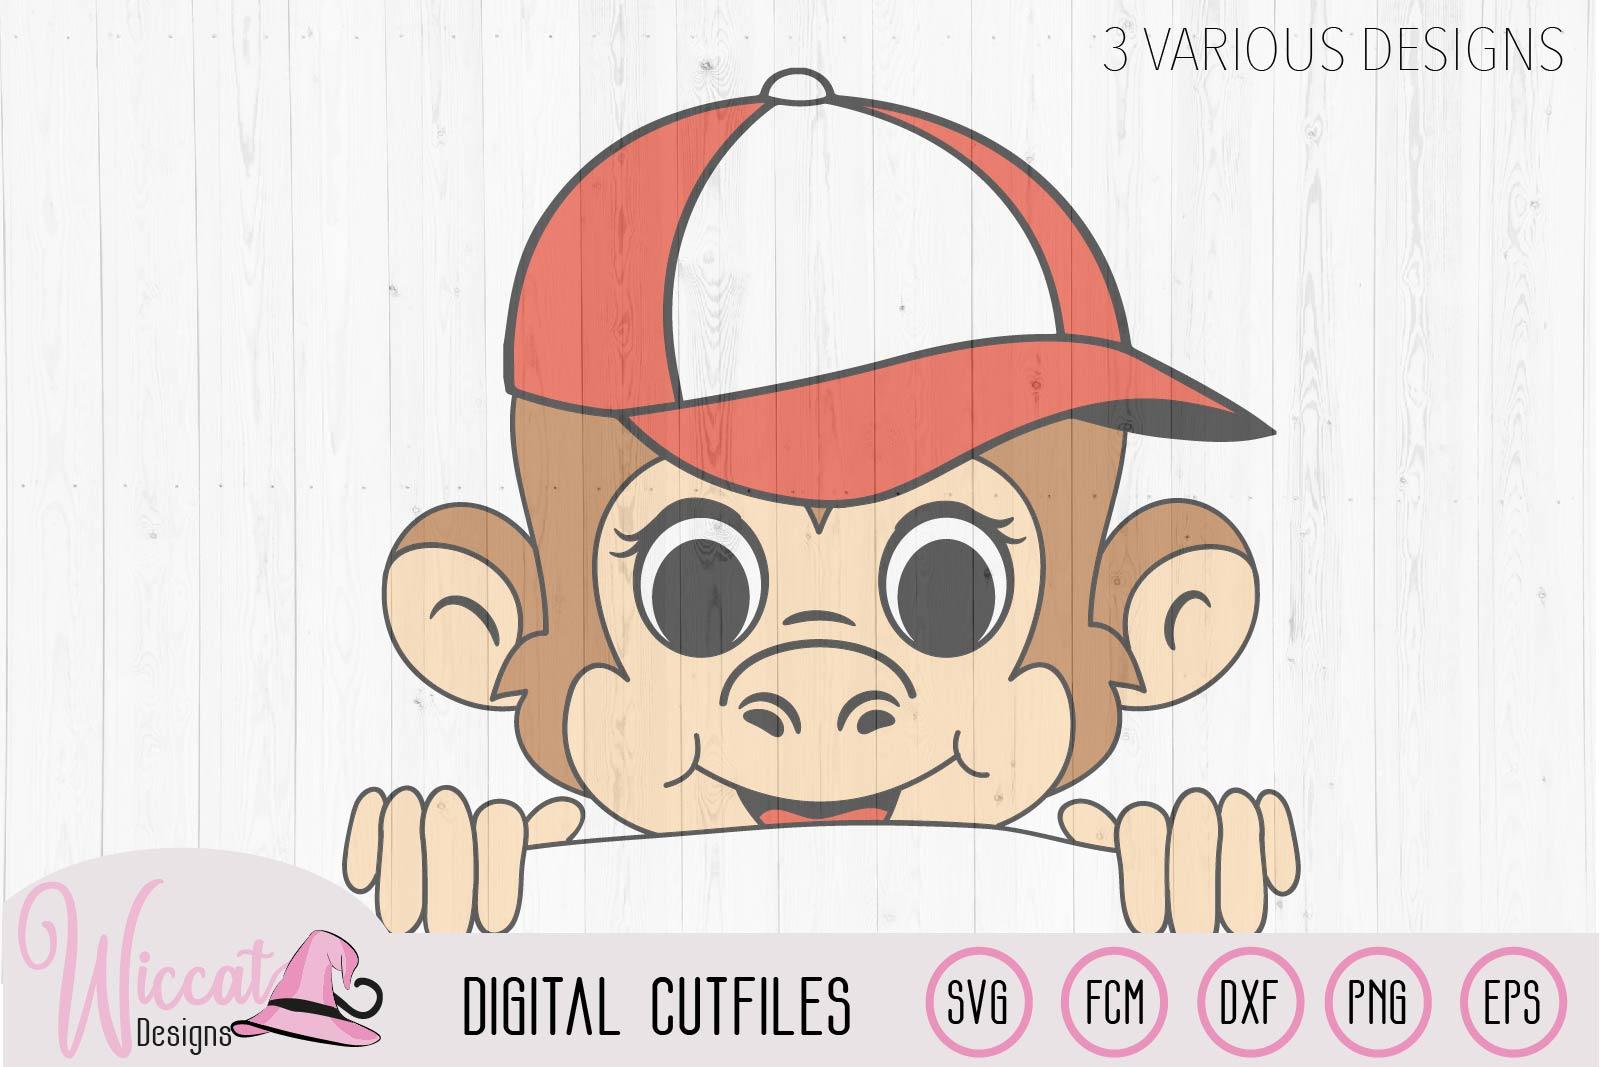 Peeka Boy monkey svg, monkey with cap, fcm cut file example image 3